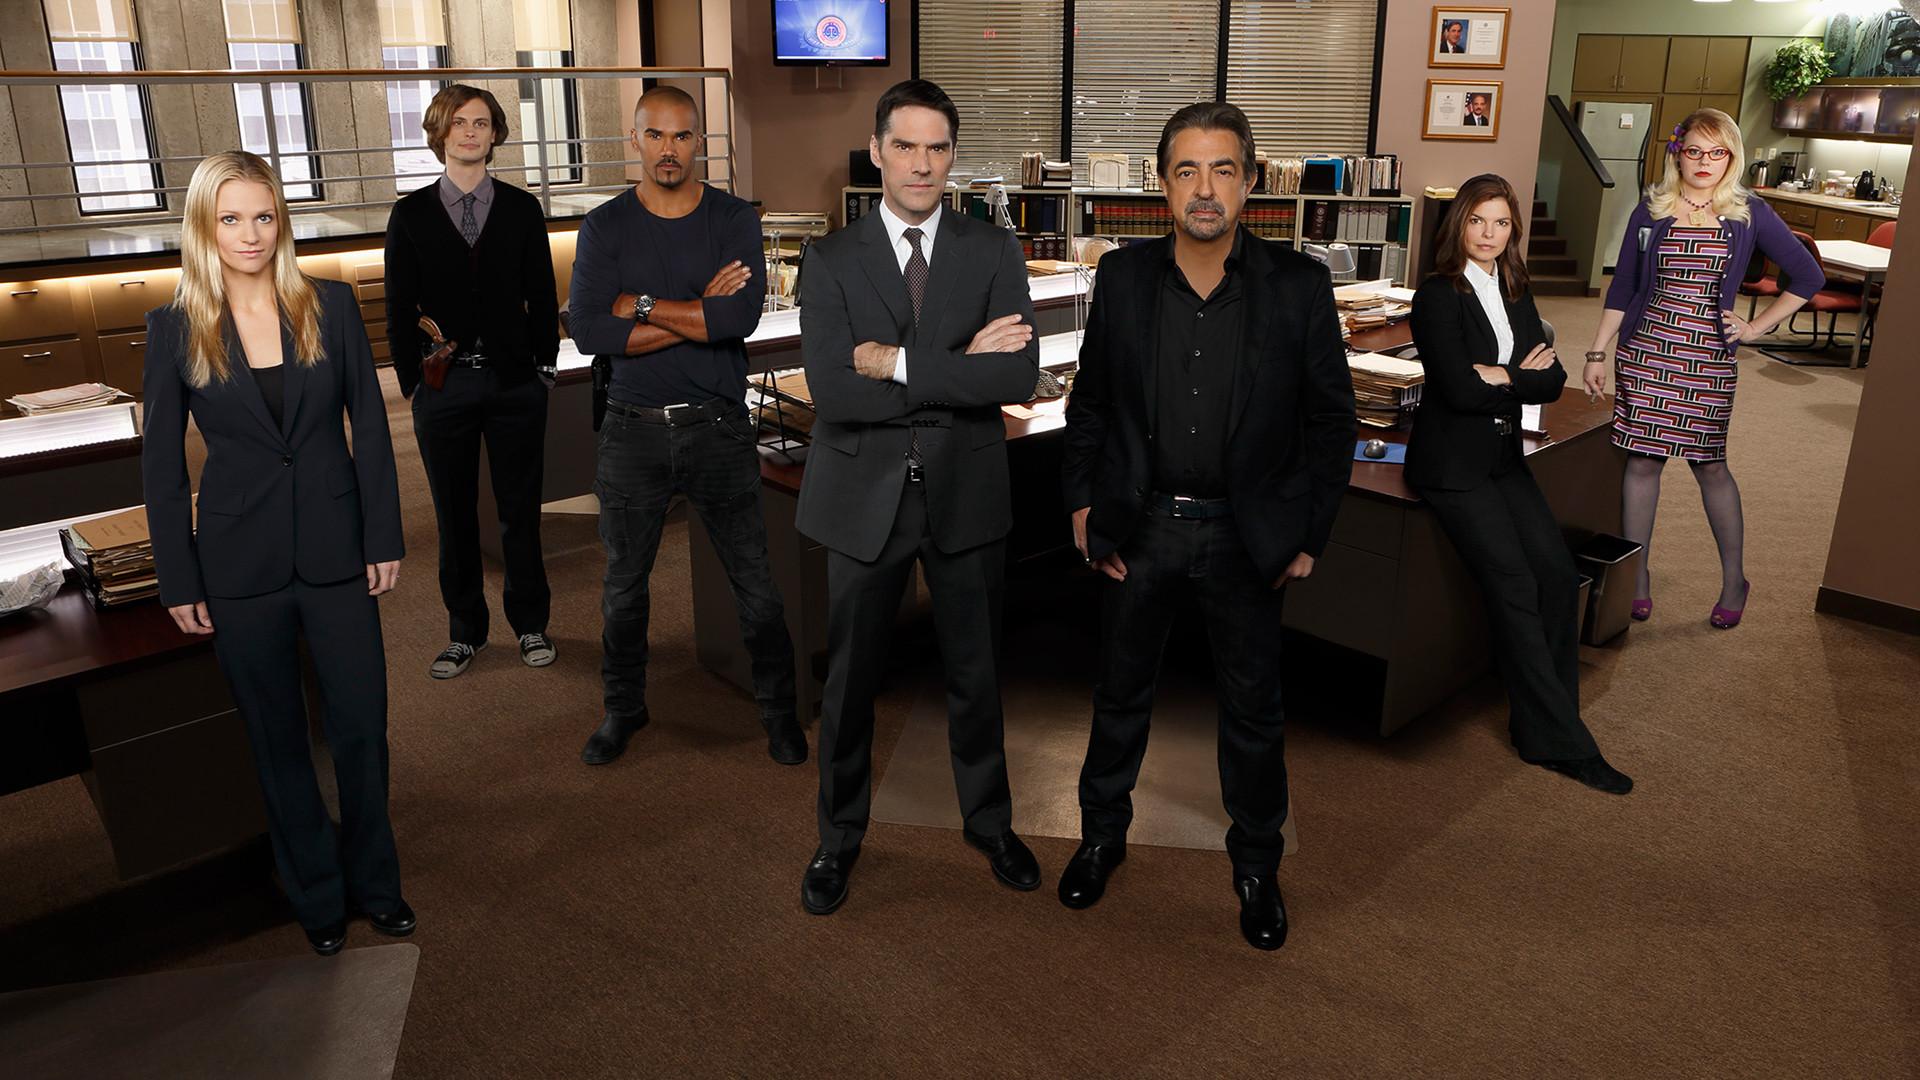 Criminal Minds (S07E21): Divining Rod Summary - Season 7 Episode 21